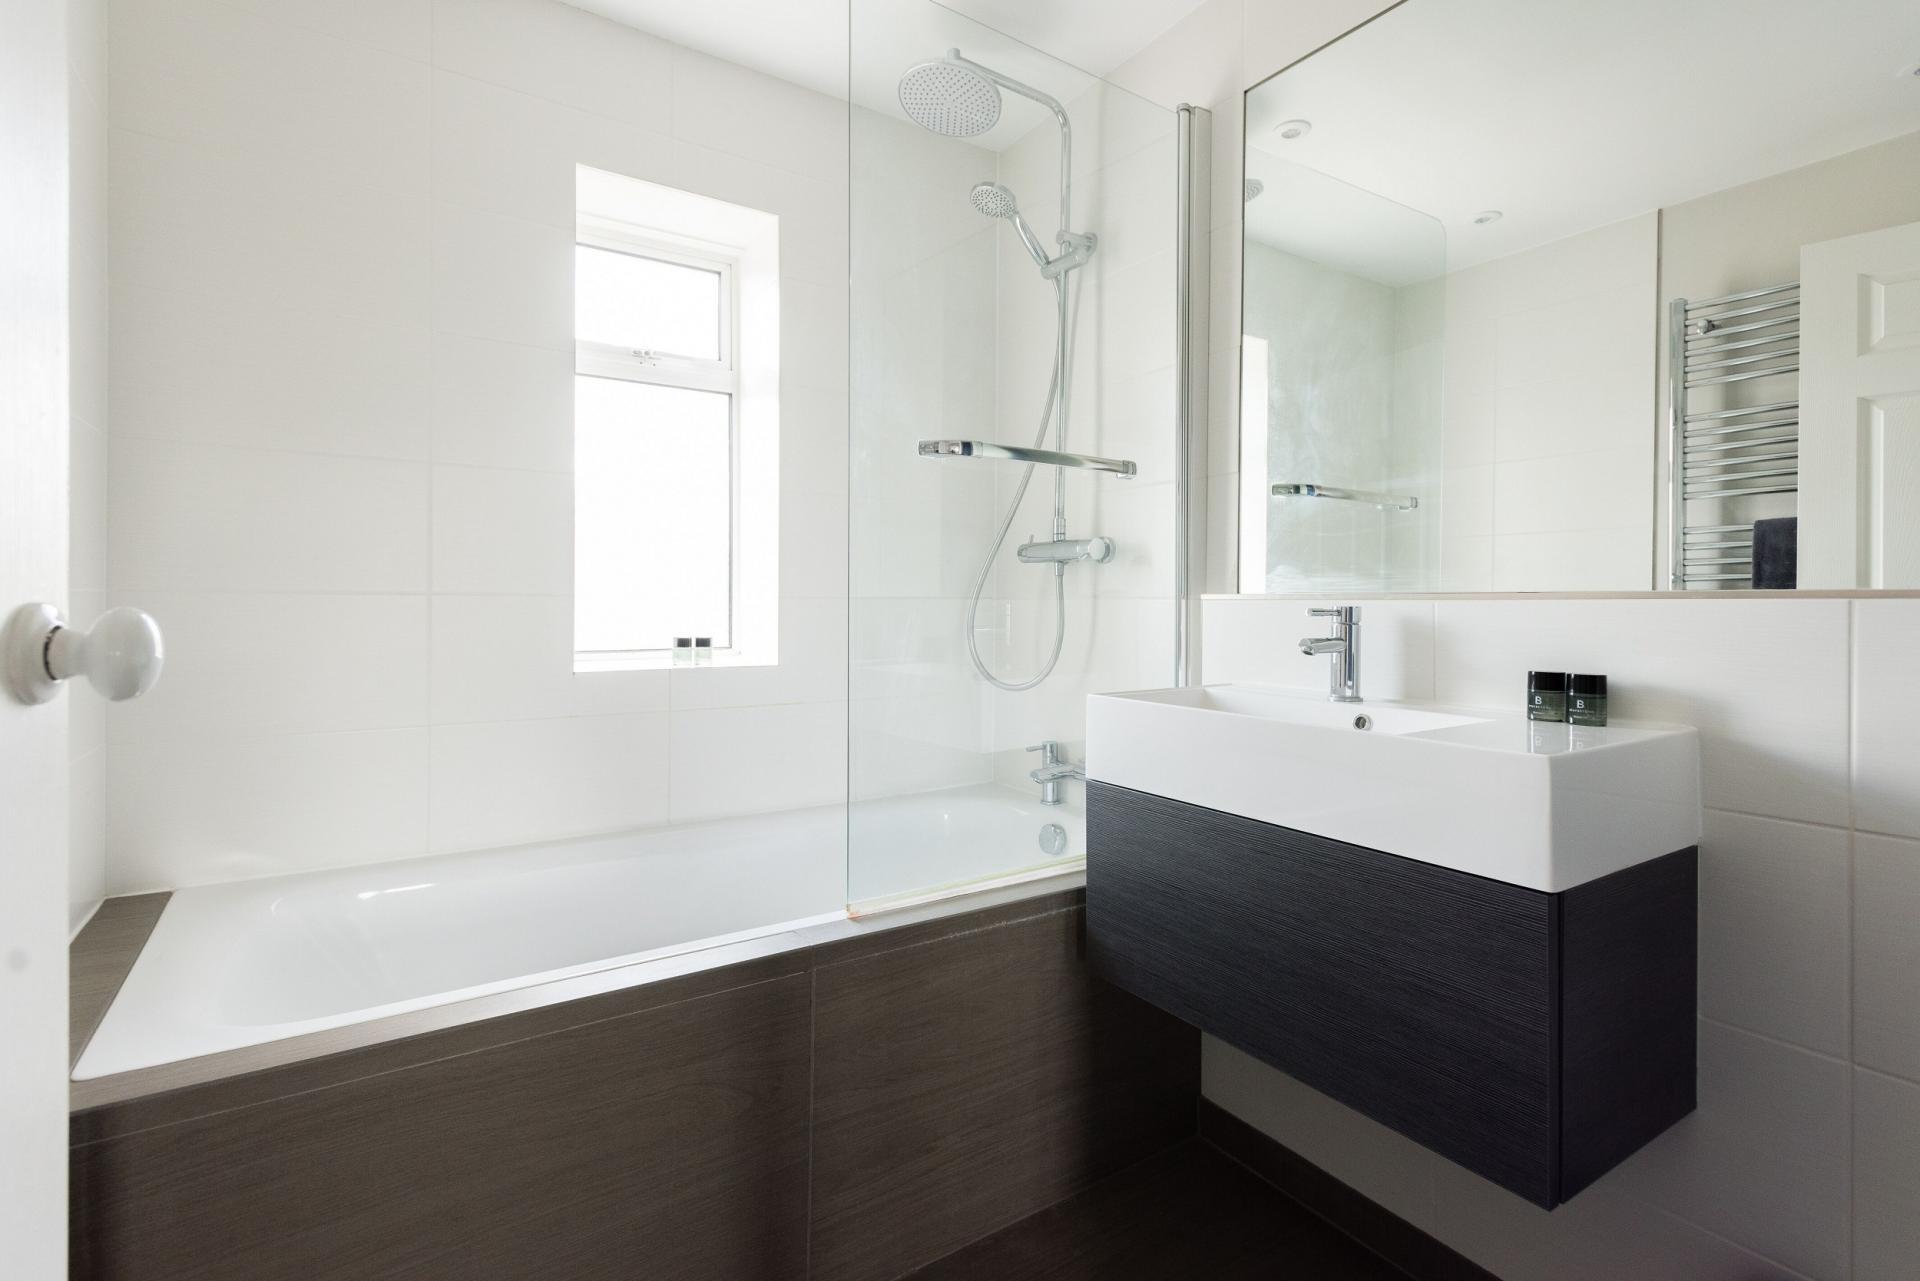 Bathroom at The Press House - Citybase Apartments